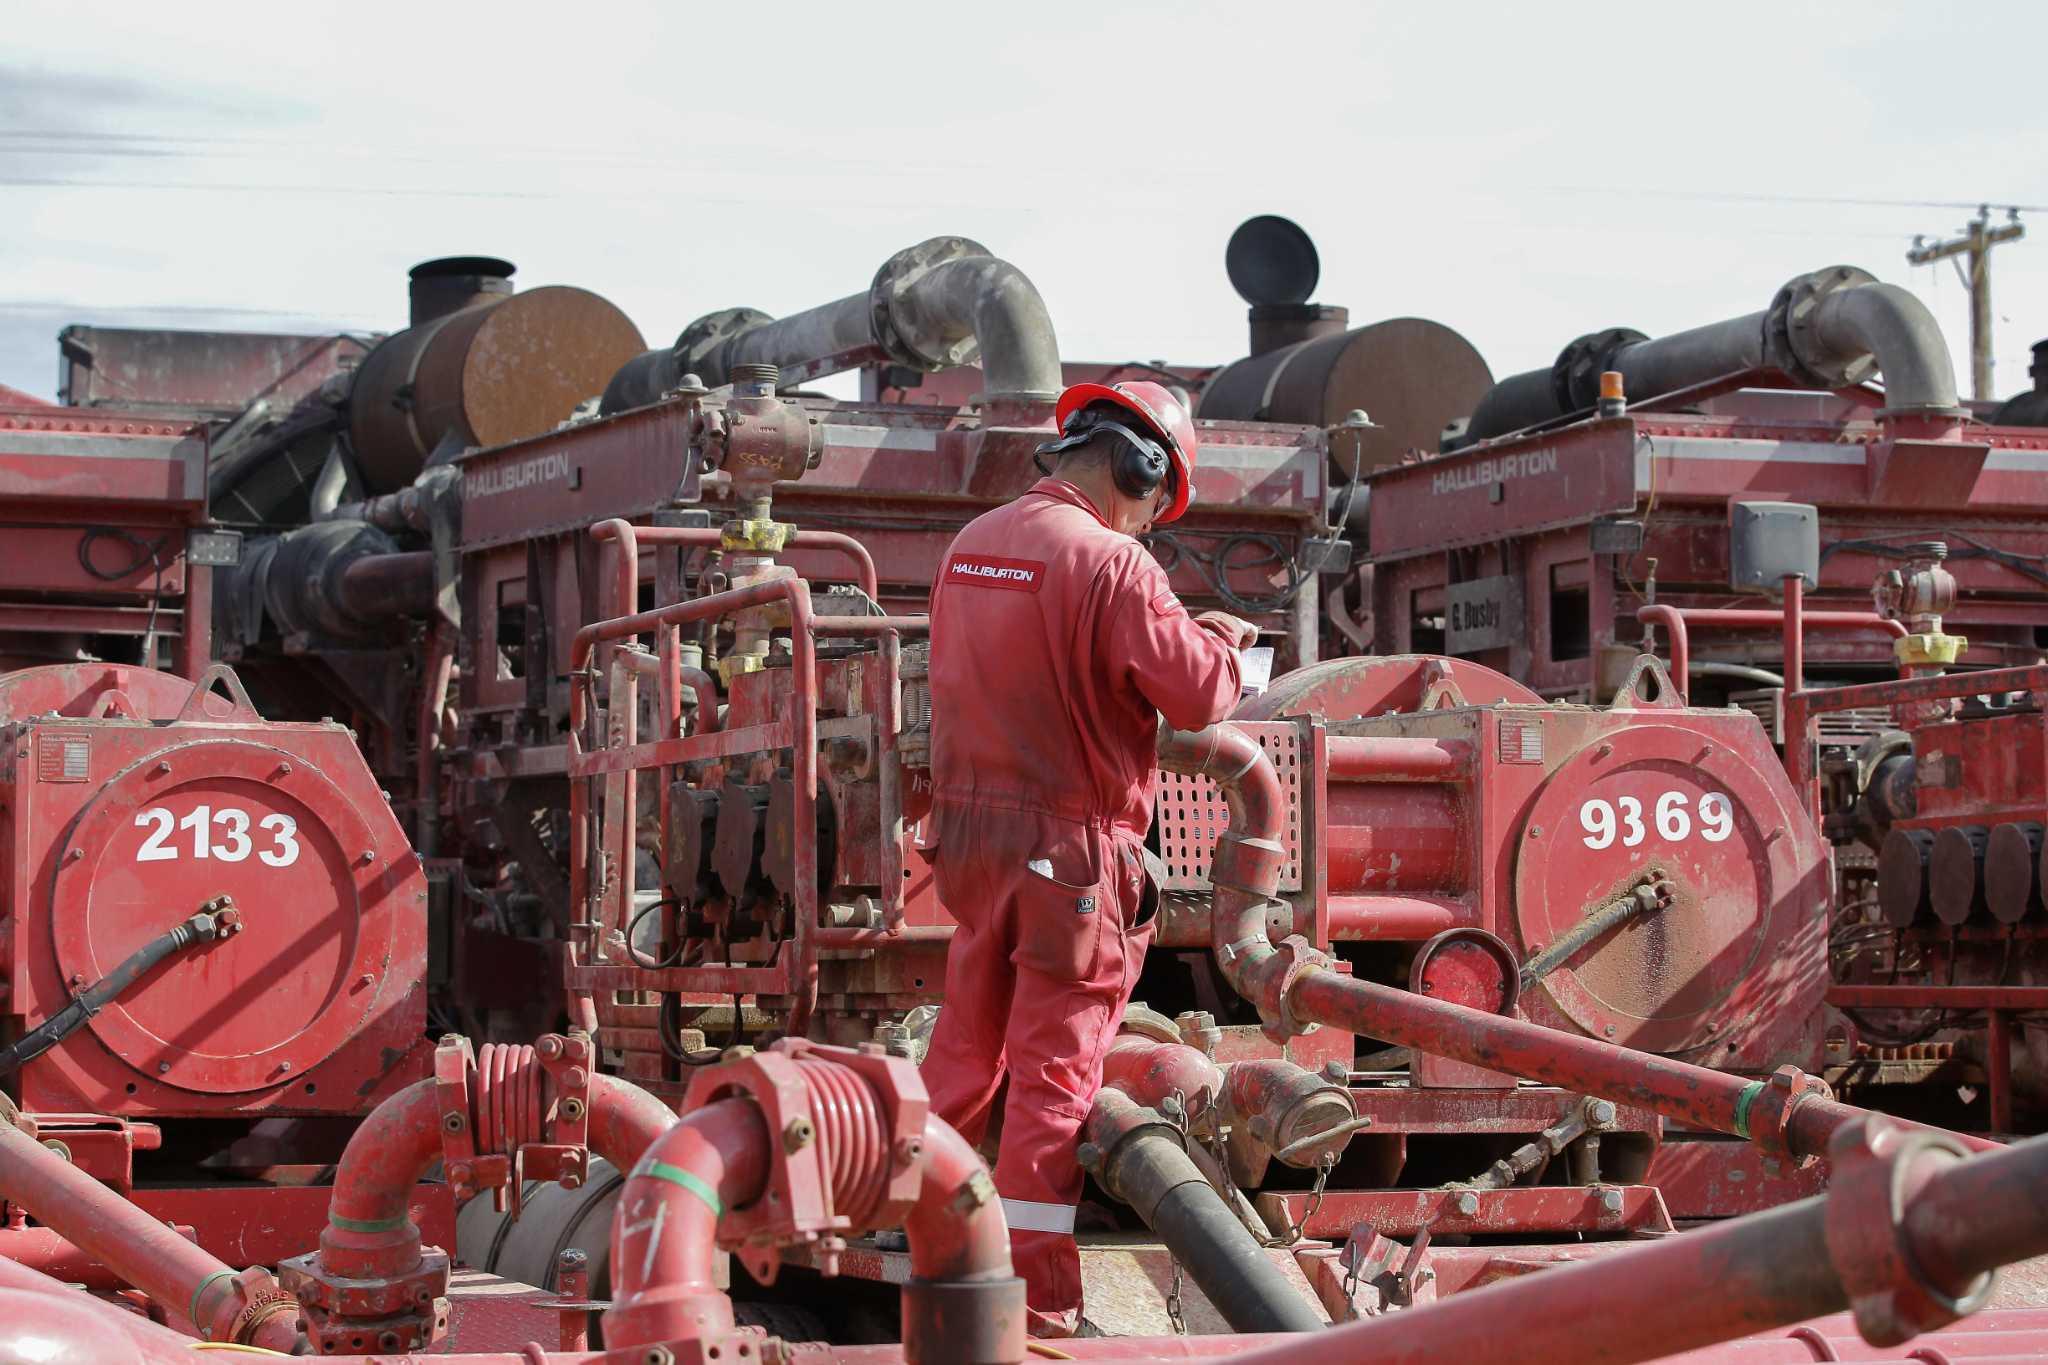 Permian Basin reclaims status as top destination for frac crews